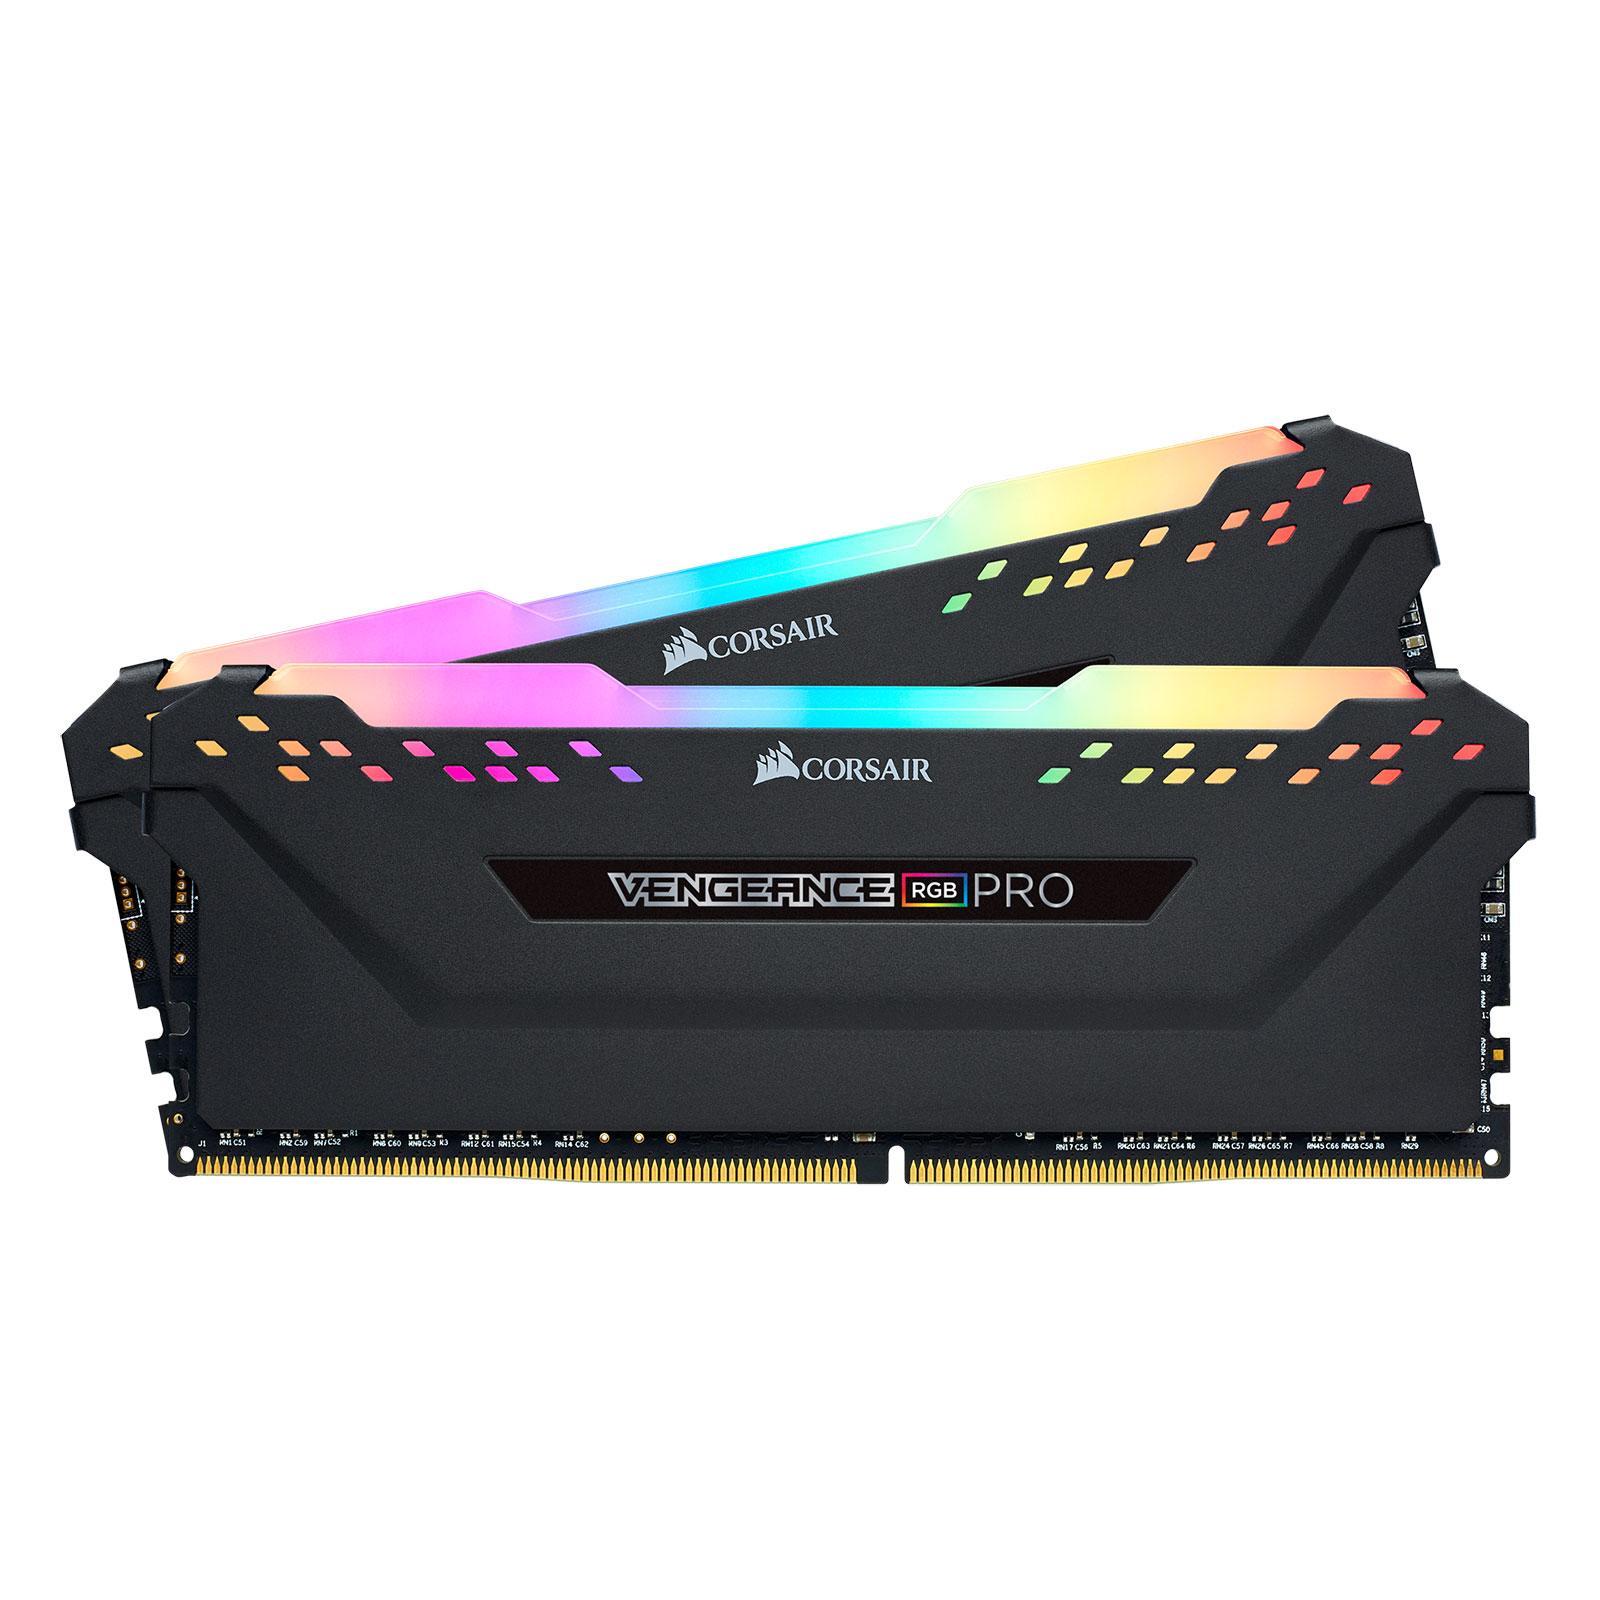 Corsair CMW16GX4M2C3000C15 RGB  16Go DDR4 3000MHz - Mémoire PC - 3